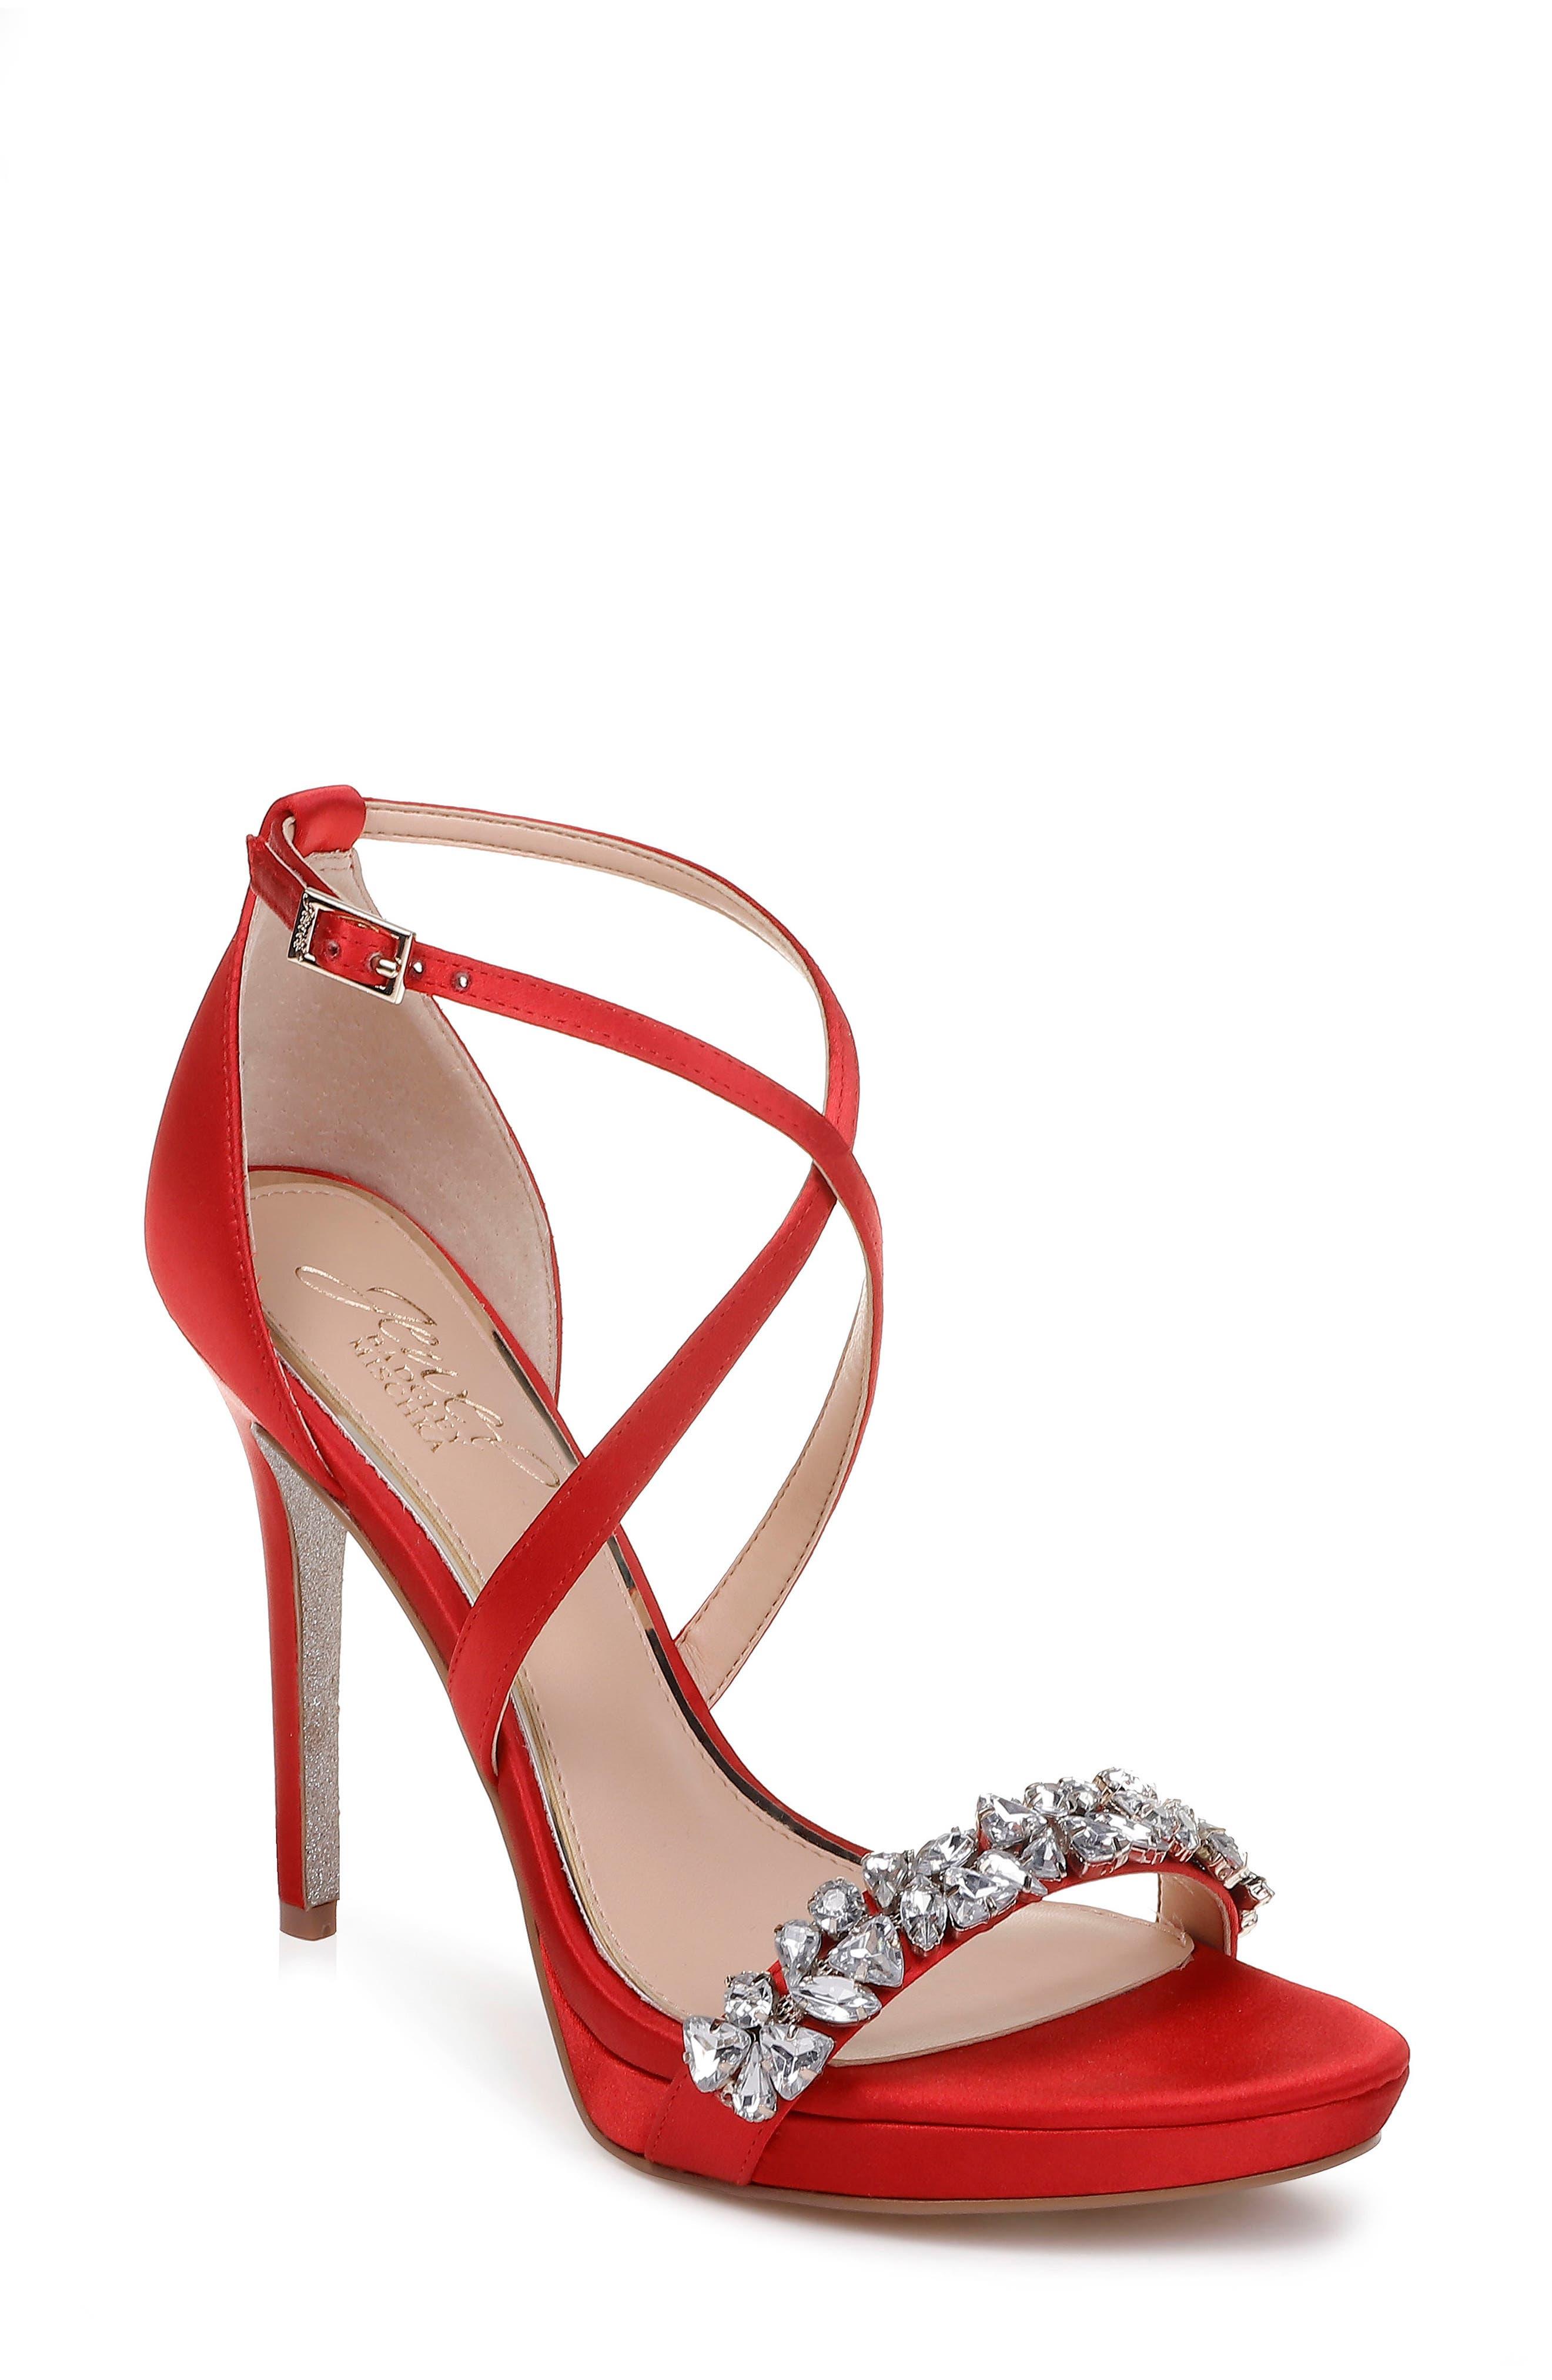 Jewel Badgley Mischka Dany Strappy Sandal- Red